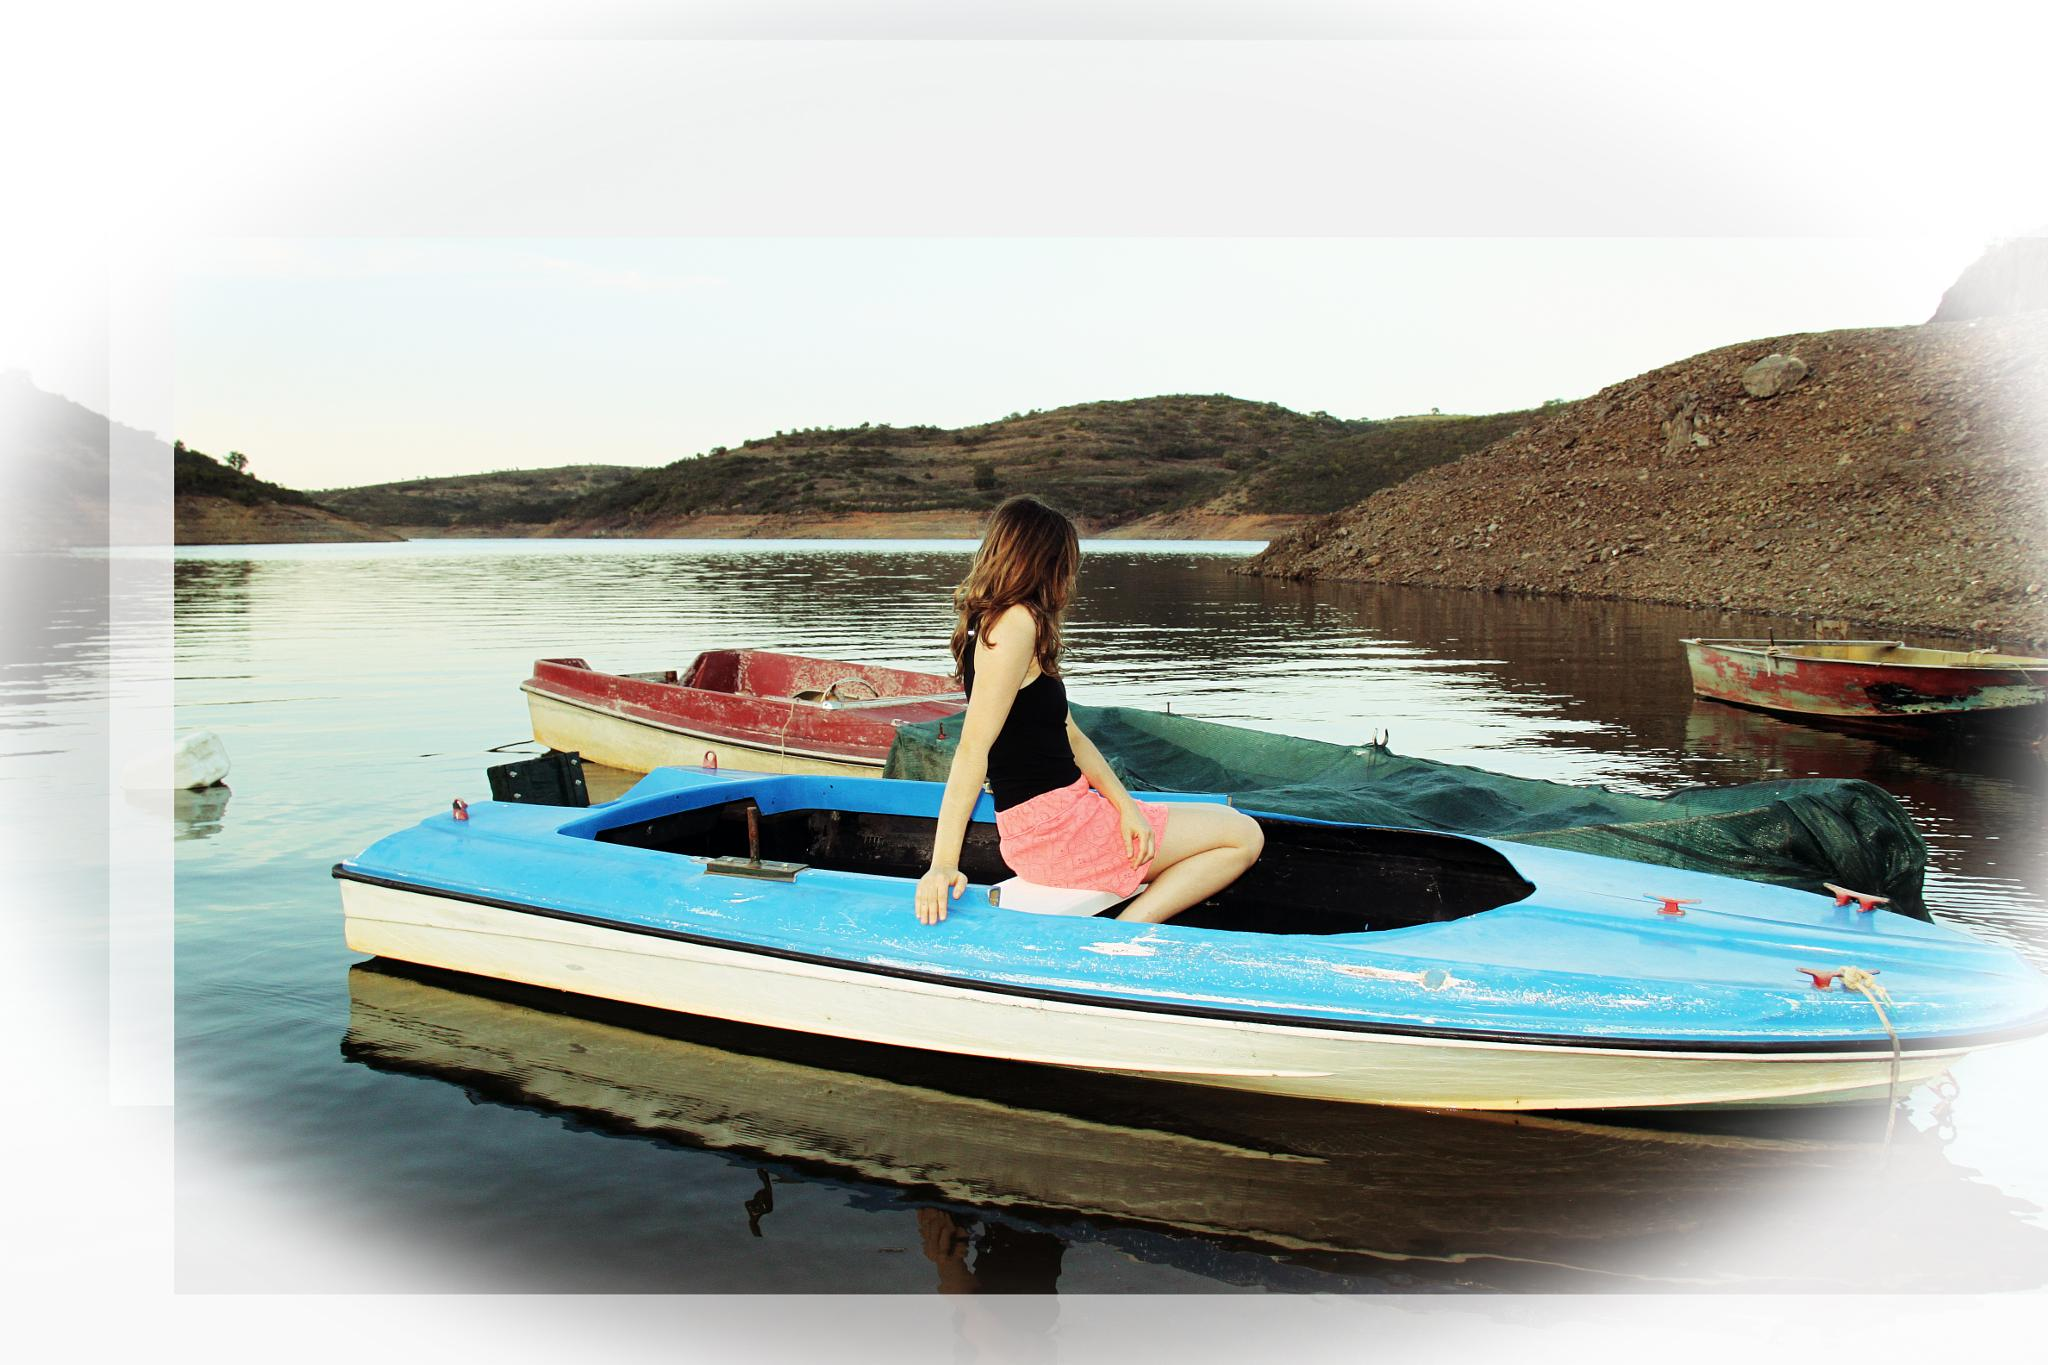 Blue boat by antoniojppereira